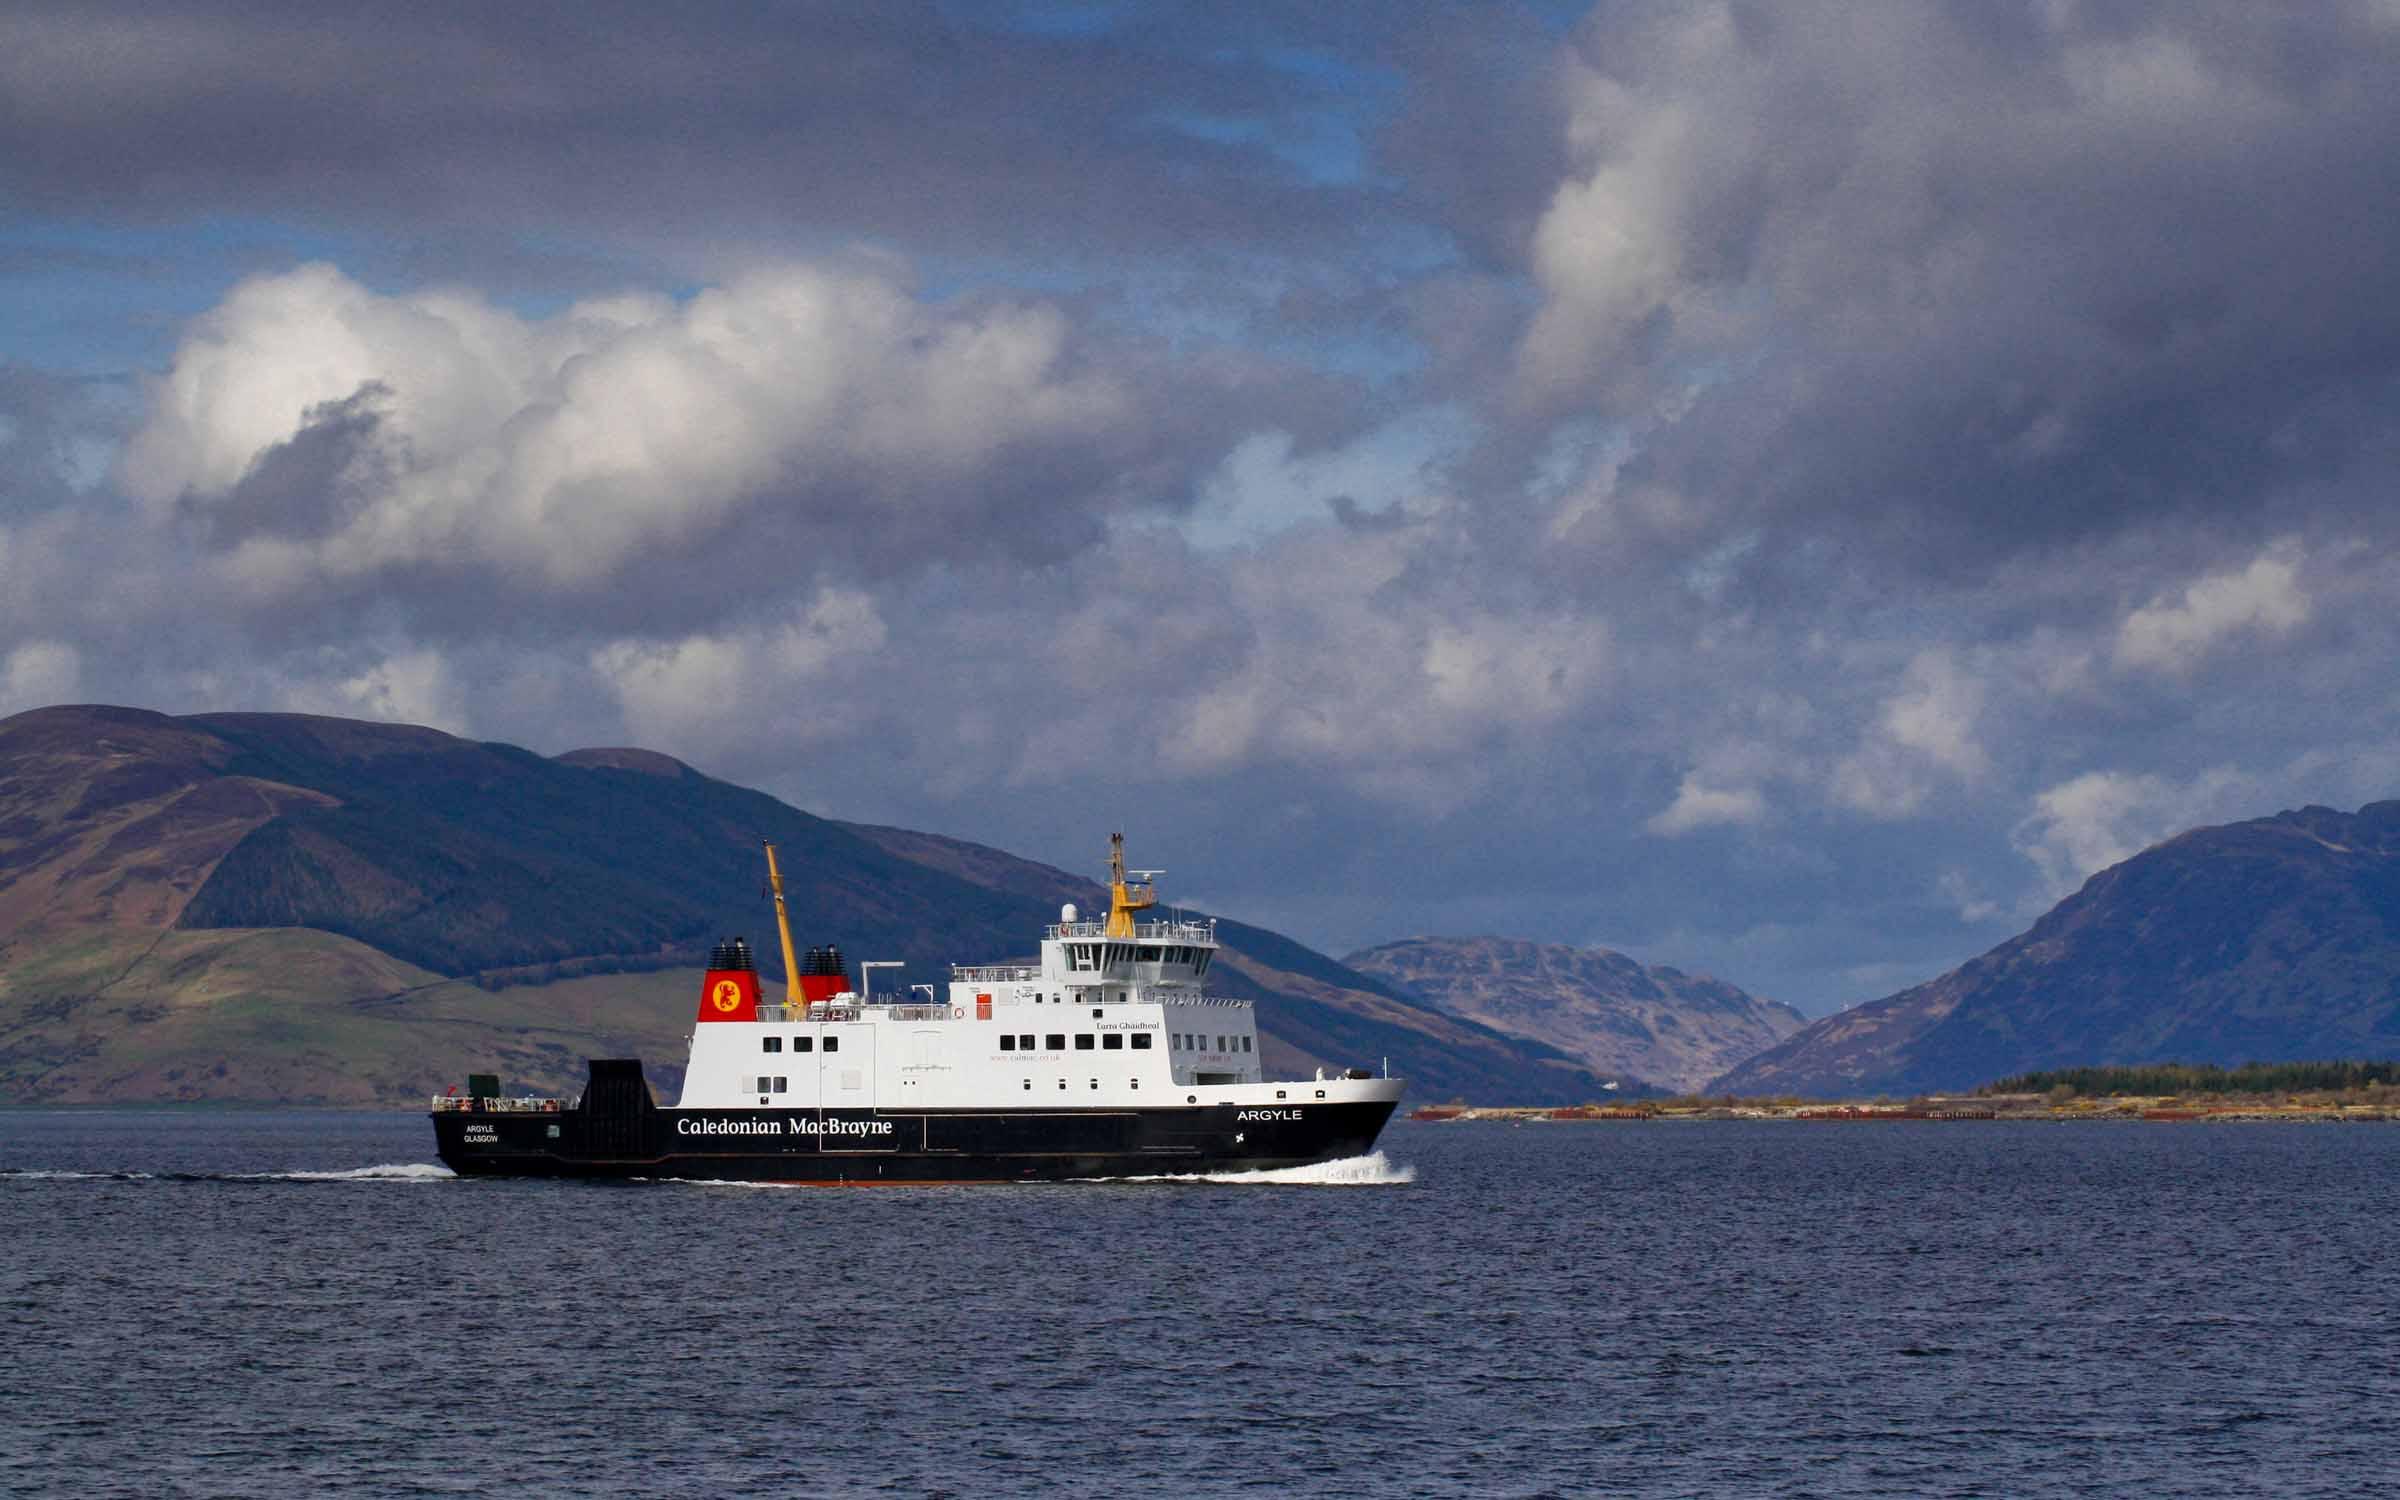 Argyle leaving Rothesay Bay (Ships of CalMac)